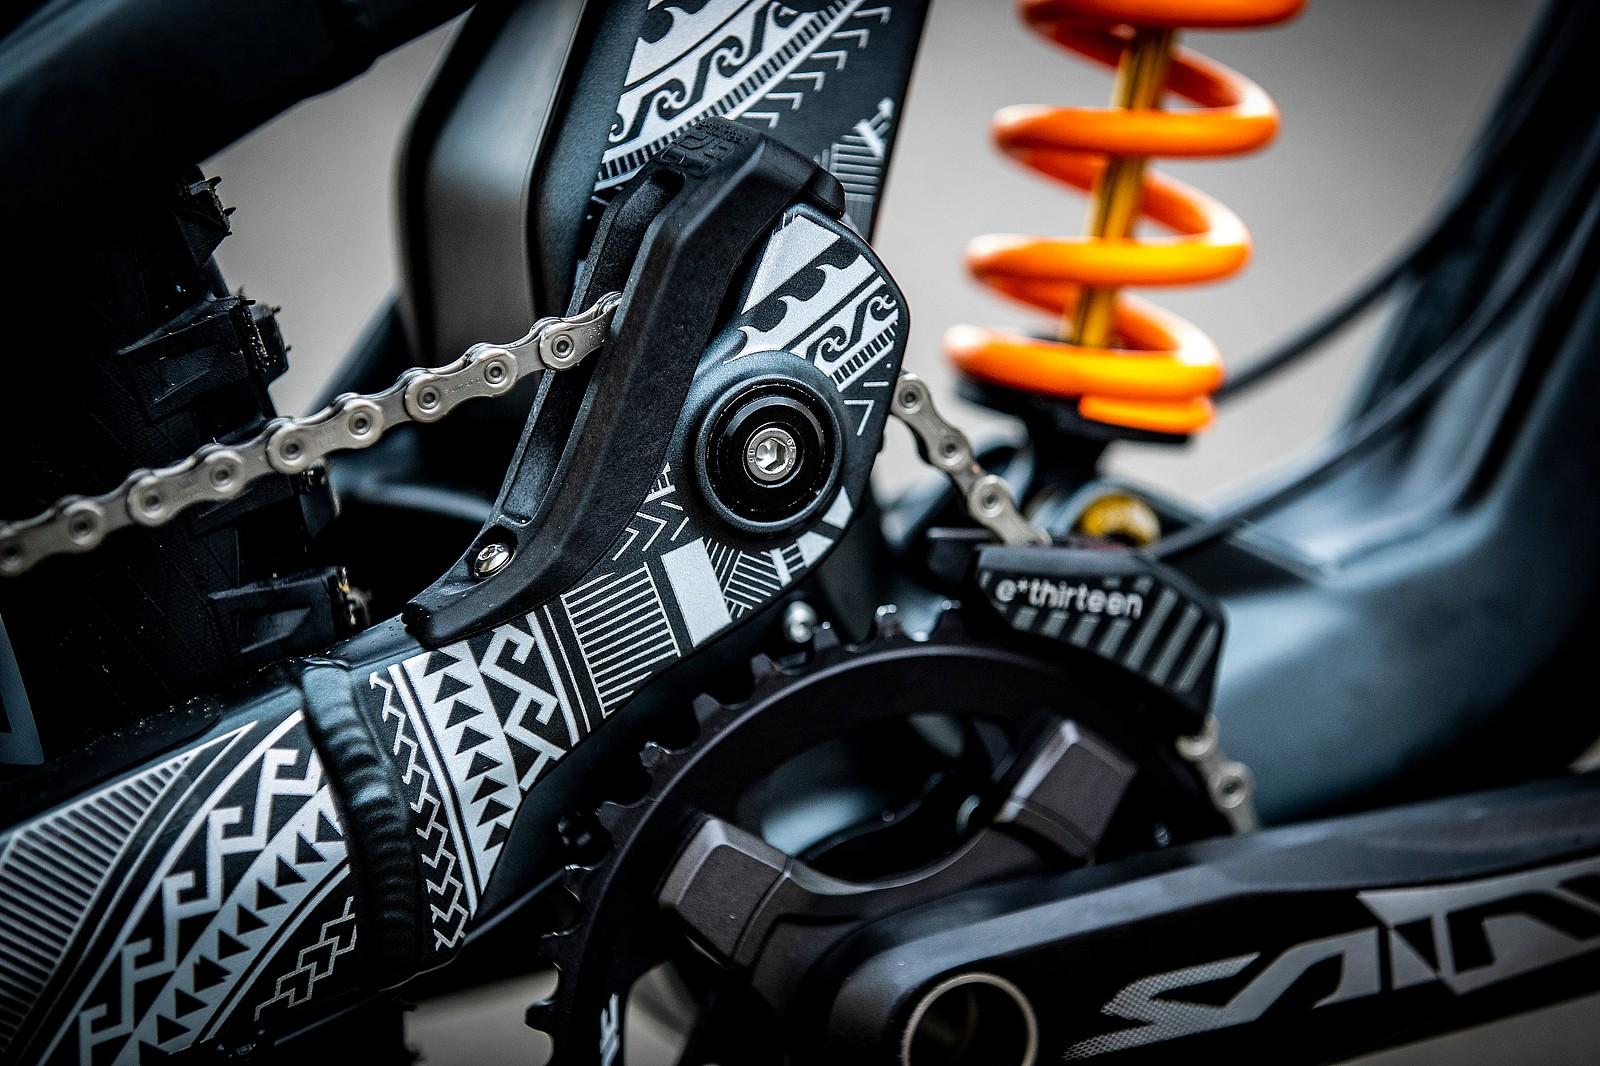 George Brannigan's GT Fury For World Championships - GT Bicycles World Championships DH Race Bikes - Mountain Biking Pictures - Vital MTB